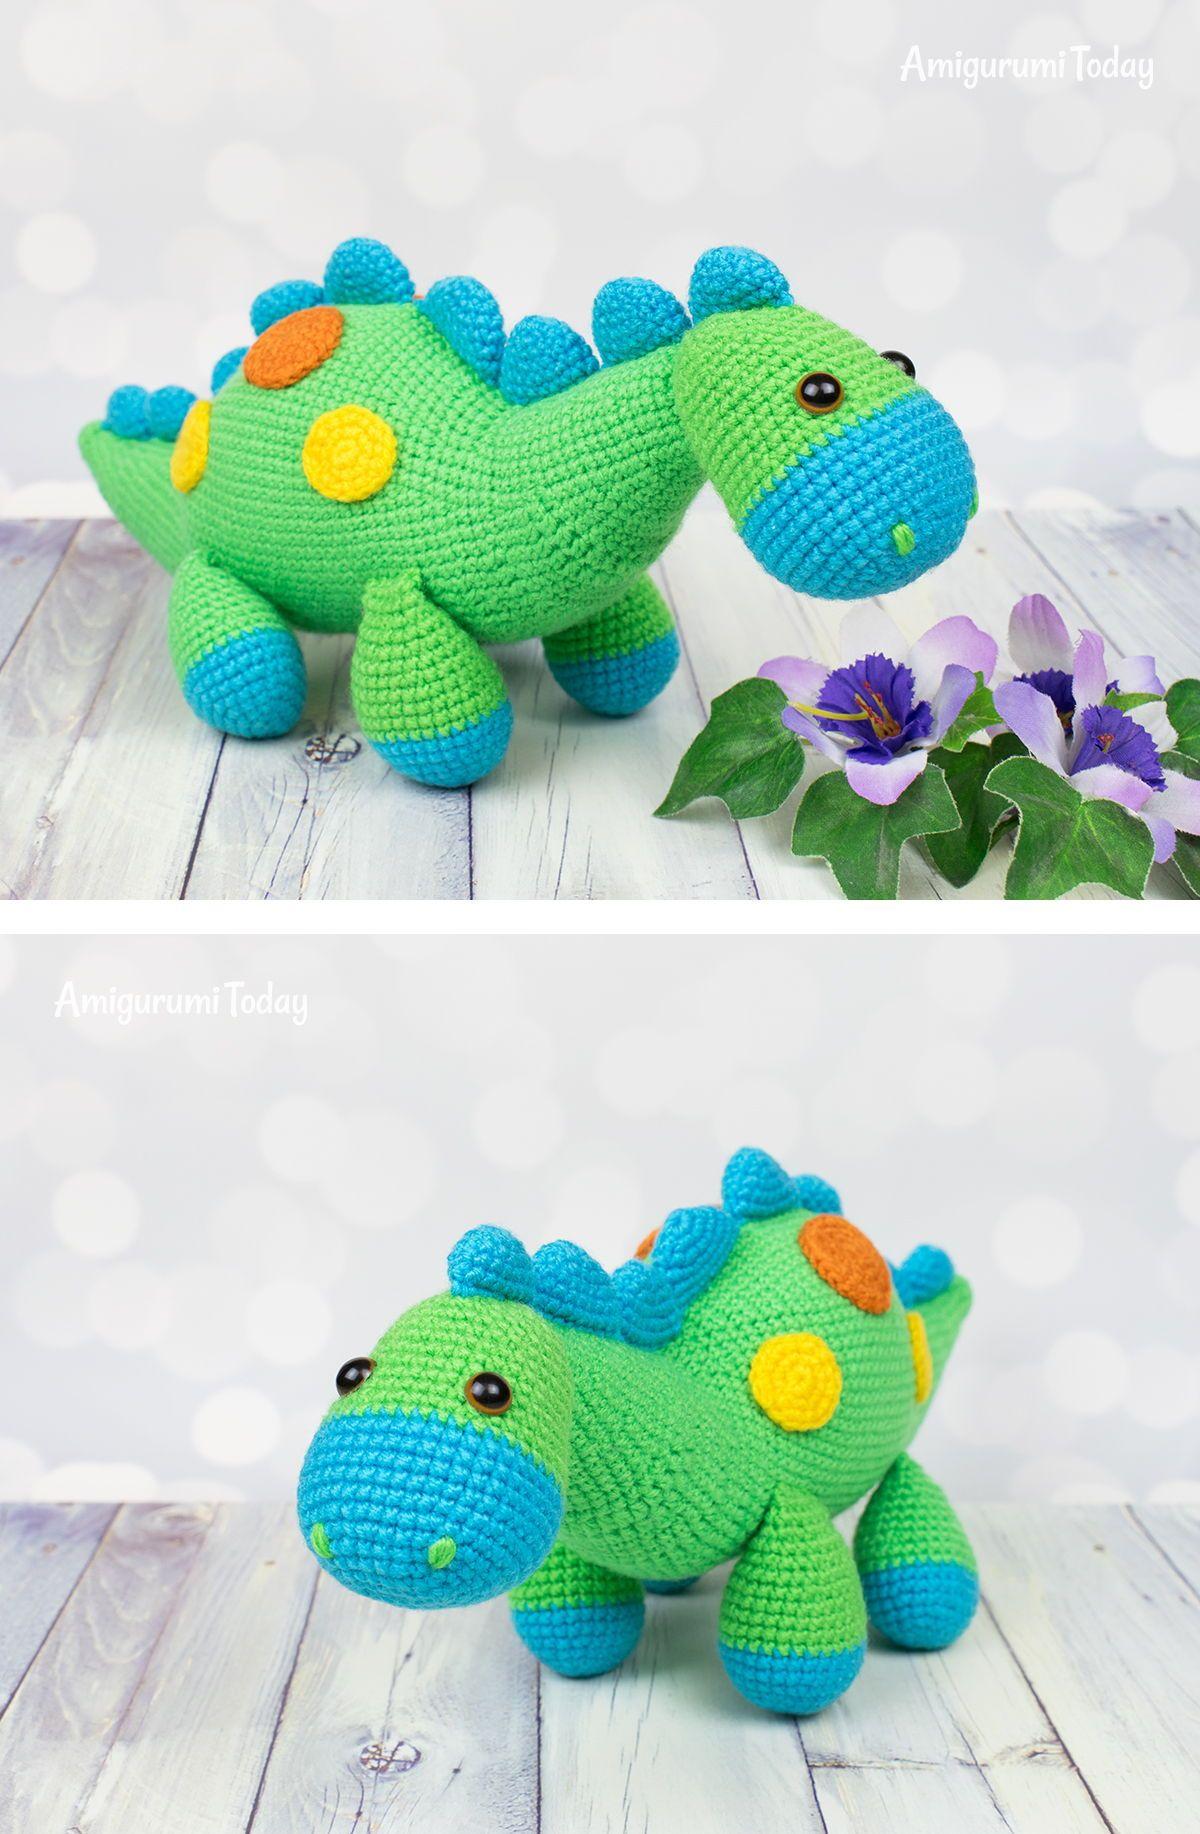 My Friend Dinosaur Dino Amigurumi Crochet Pattern | 1834x1200